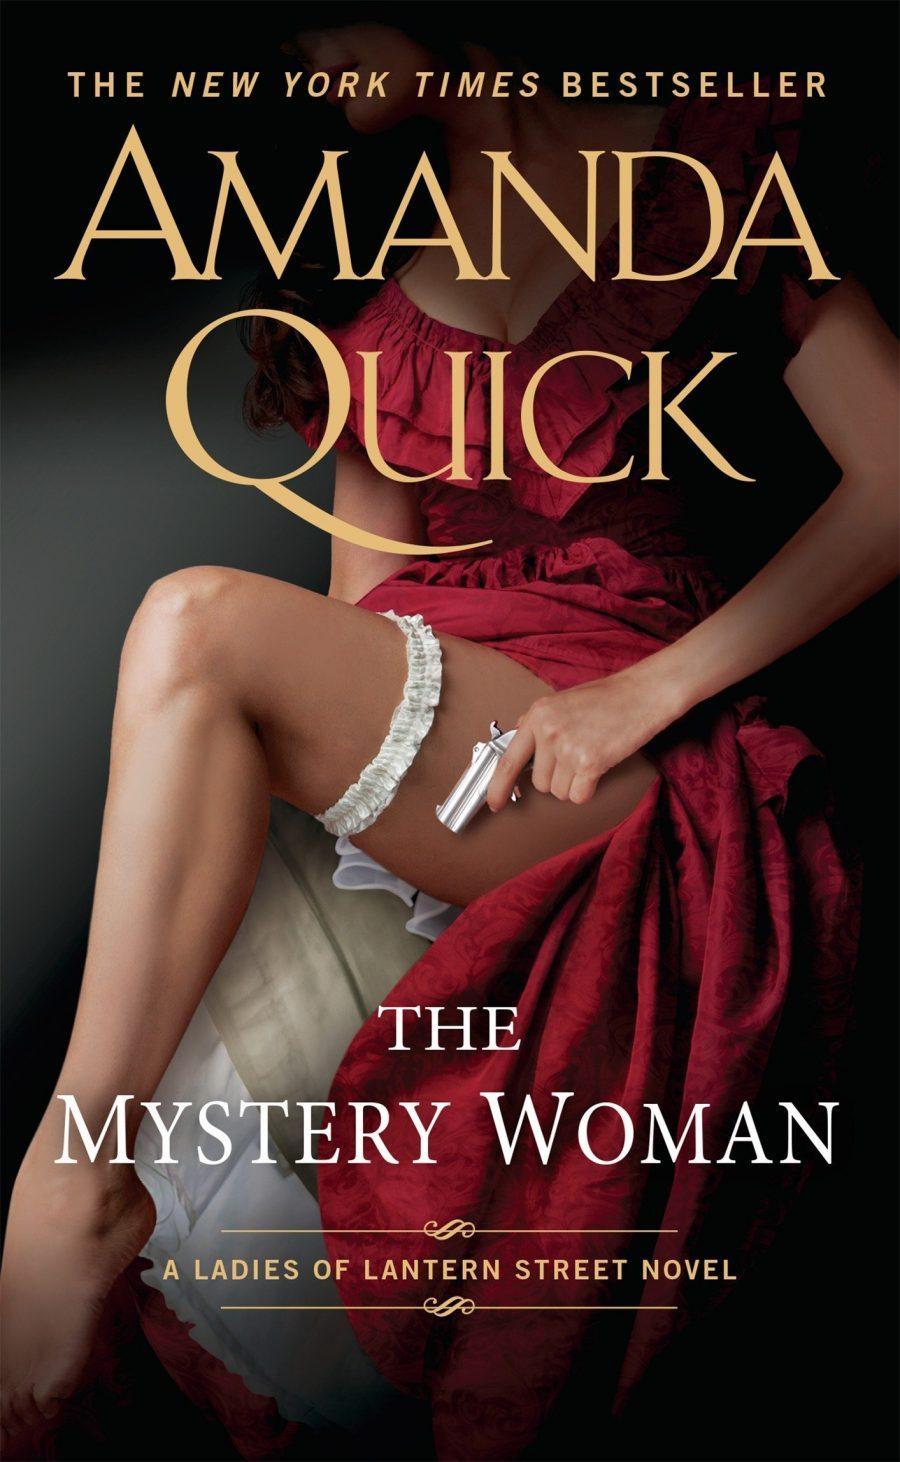 The Mystery Woman: A Ladies Of Lantern Street Novel